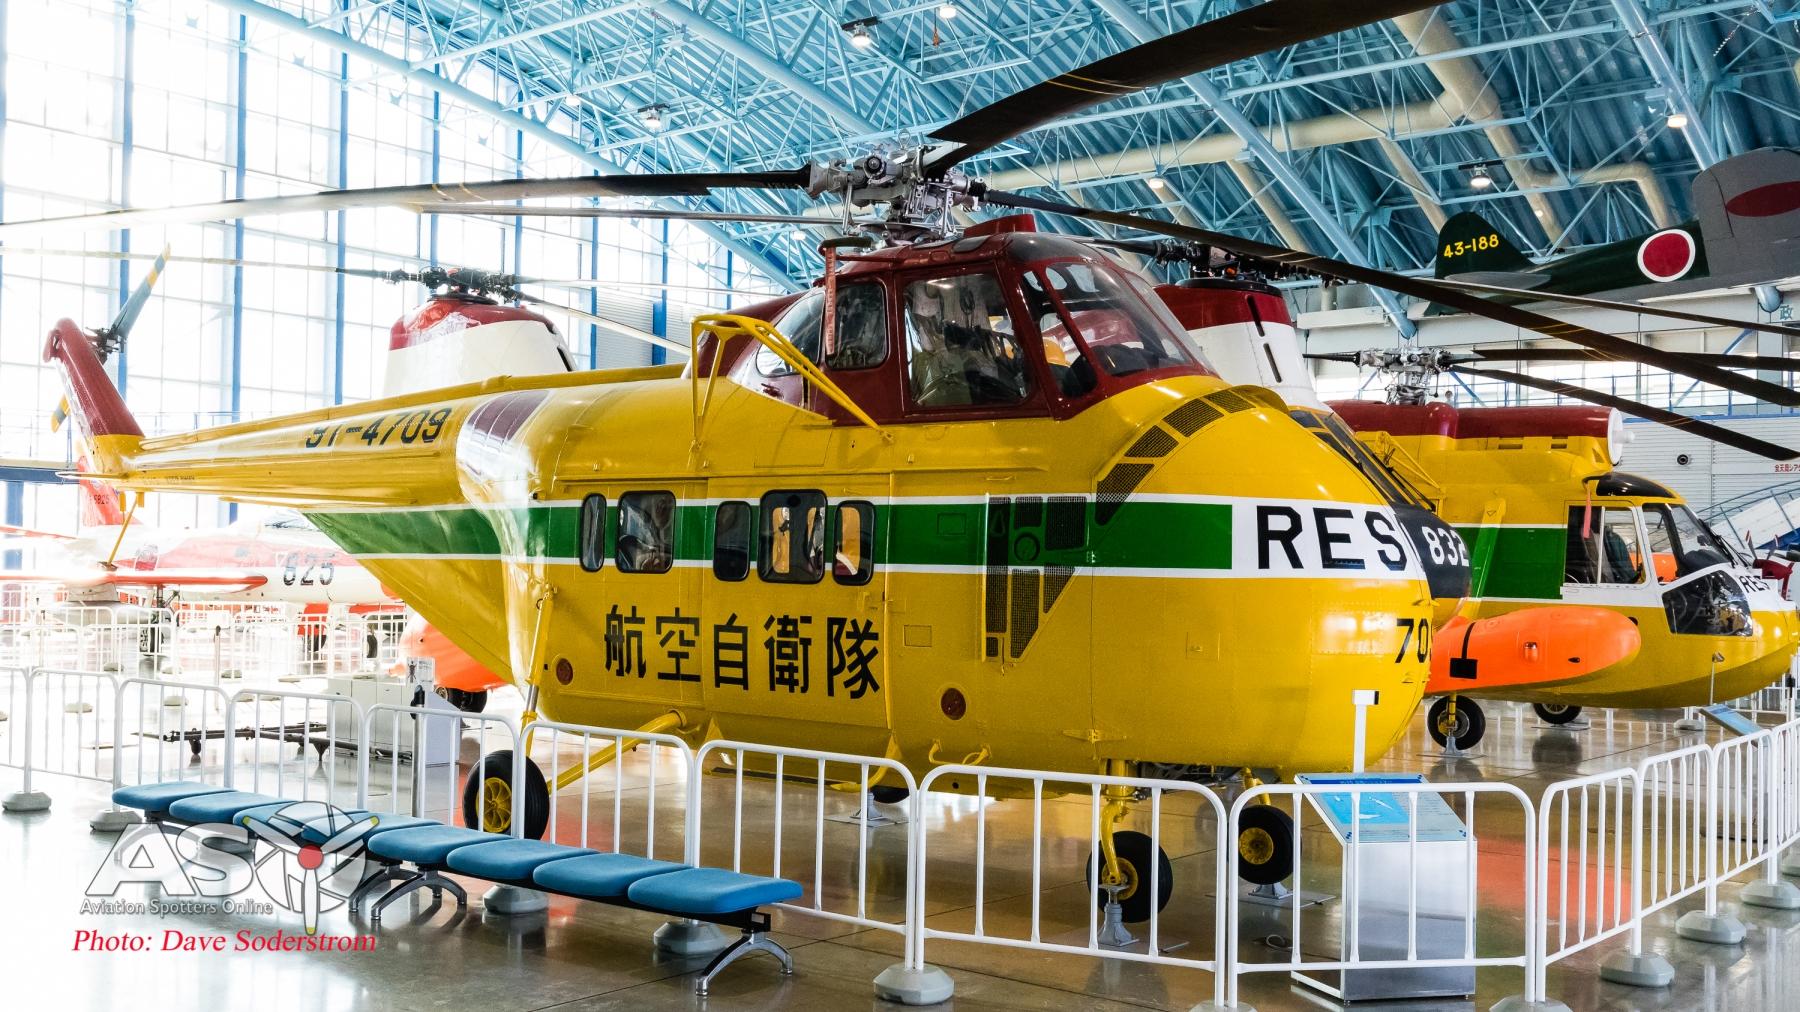 JASDF-Museum-2018-19-1-of-1